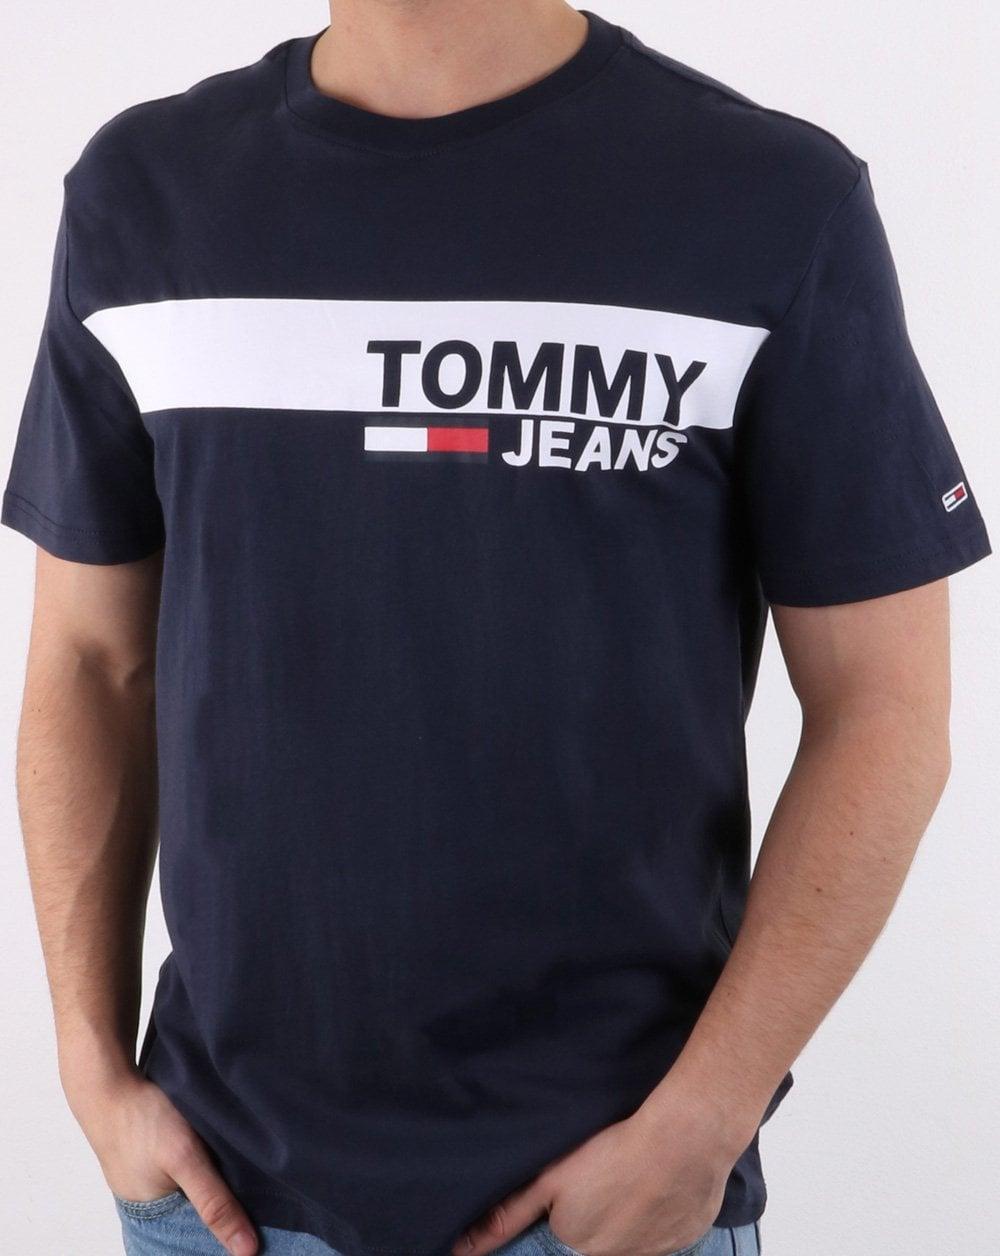 66cd99d0 Tommy Hilfiger Box Logo Tn 'Shirt Navy | 80s casual classics